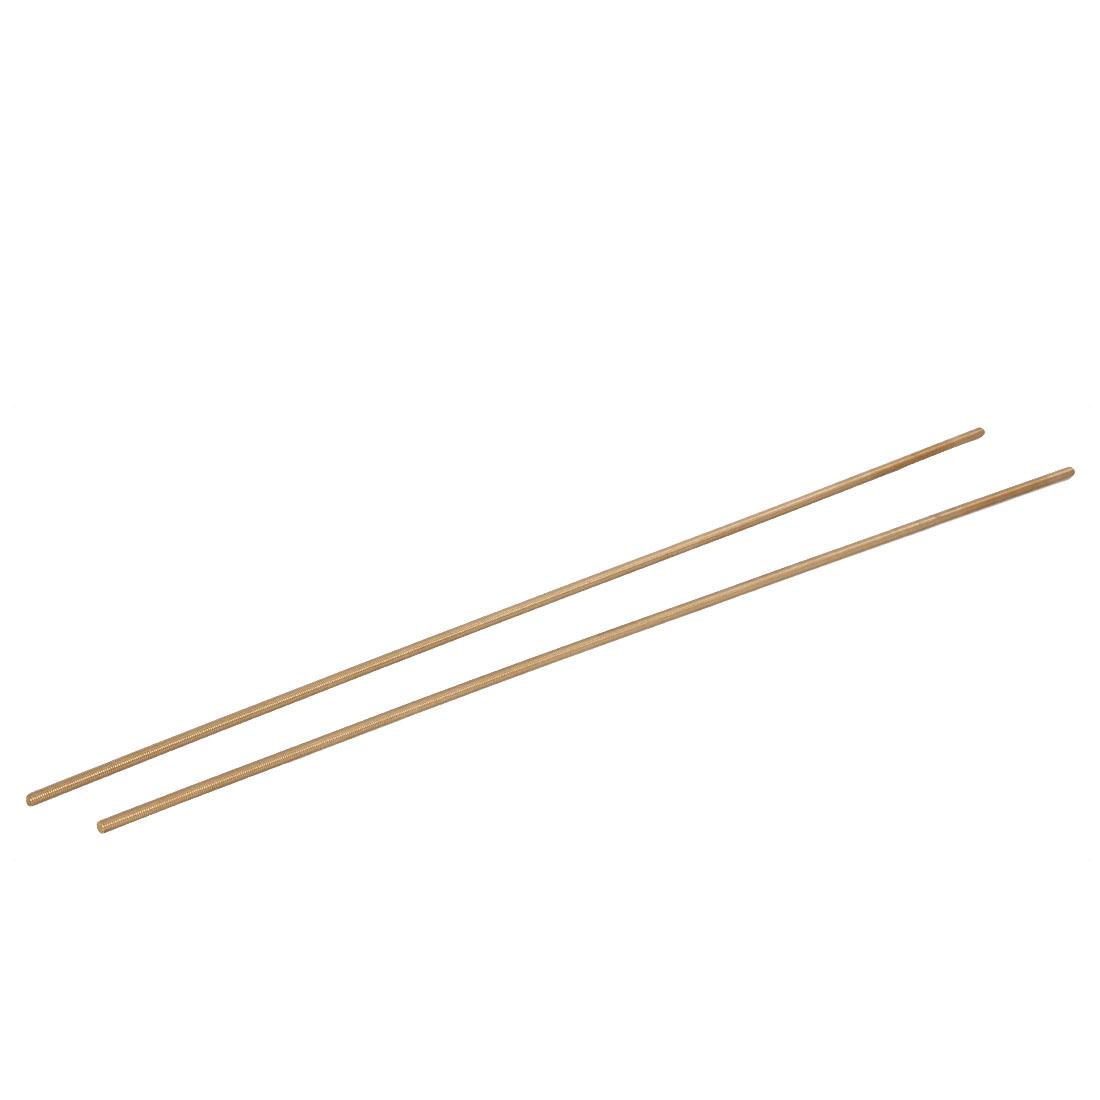 M5 x 500mm Male Threaded 0.8mm Pitch Full Thread Brass Rod Bars Hardware 2 Pcs